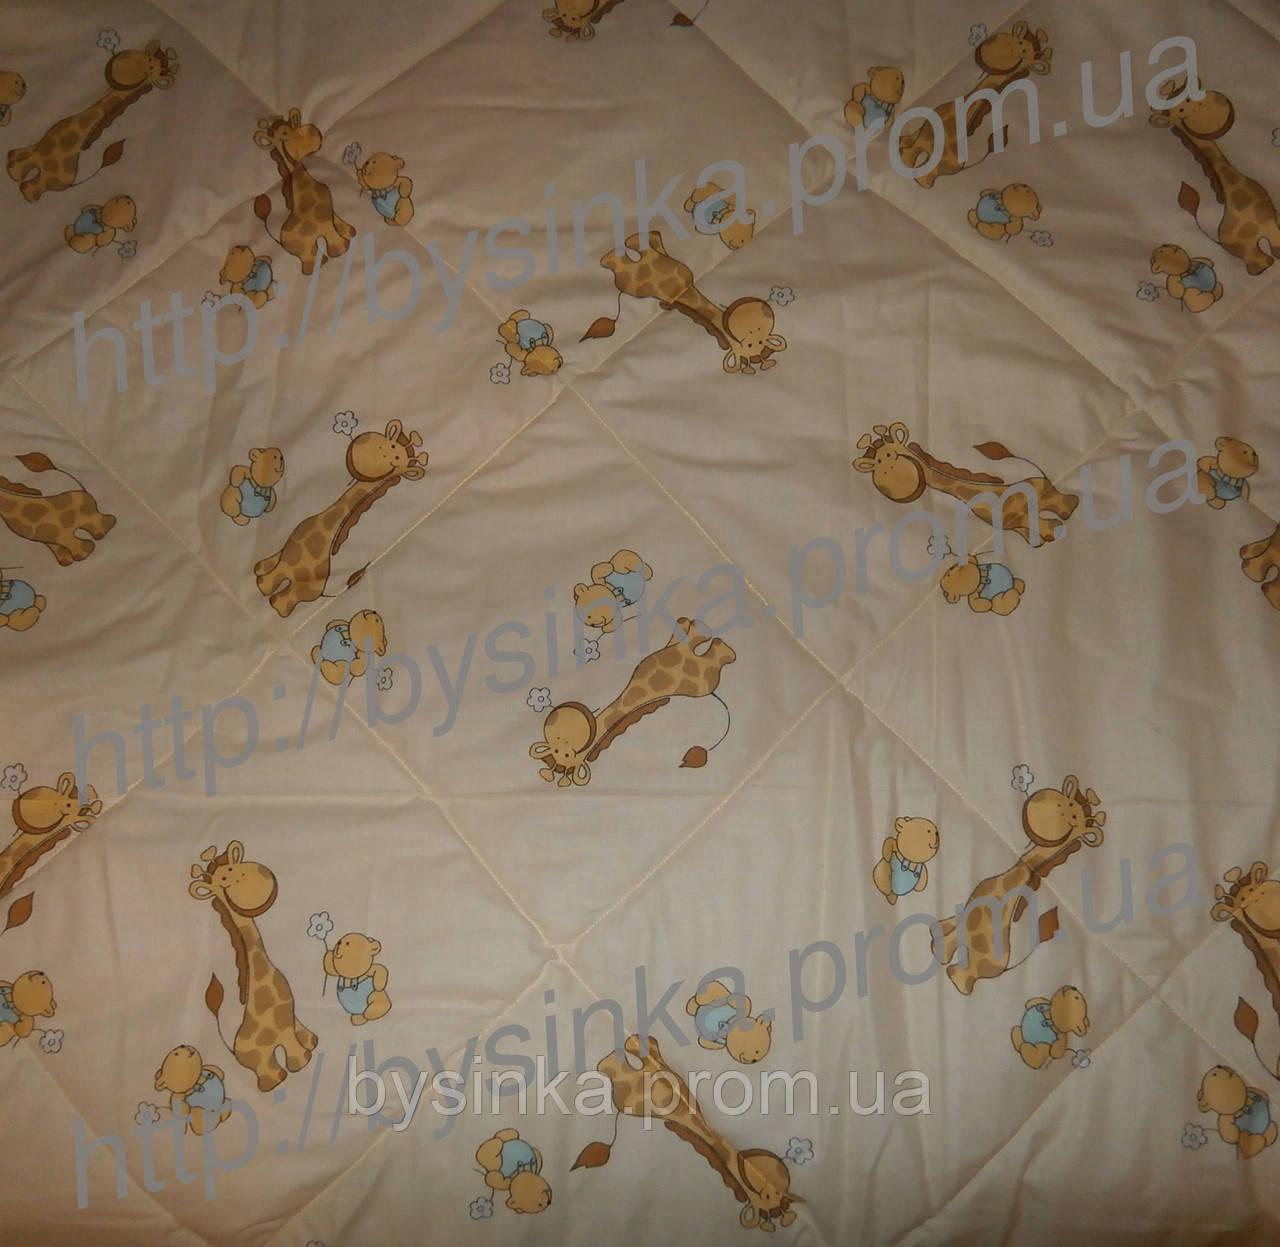 Одеяло-плед легкое, стеганное